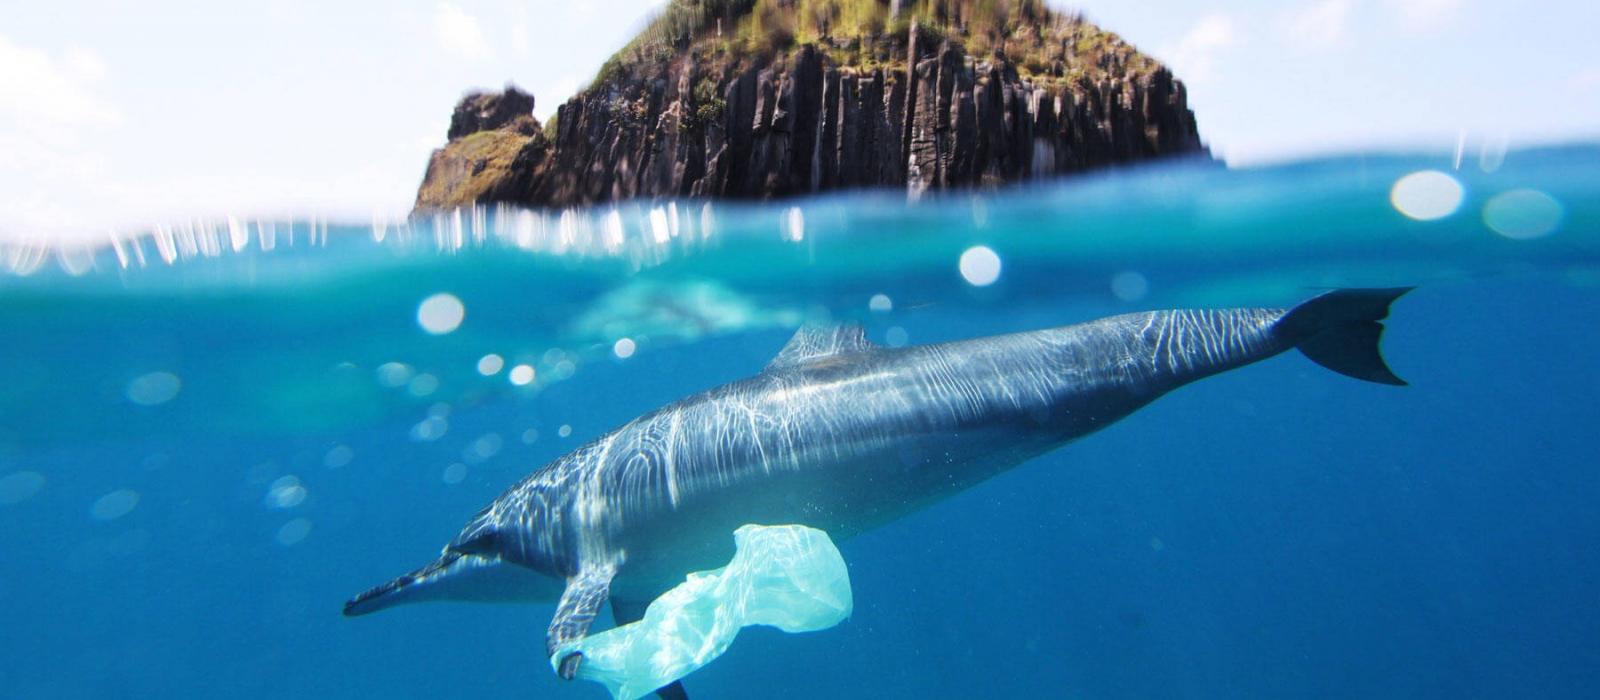 Ocean Preservation cause image